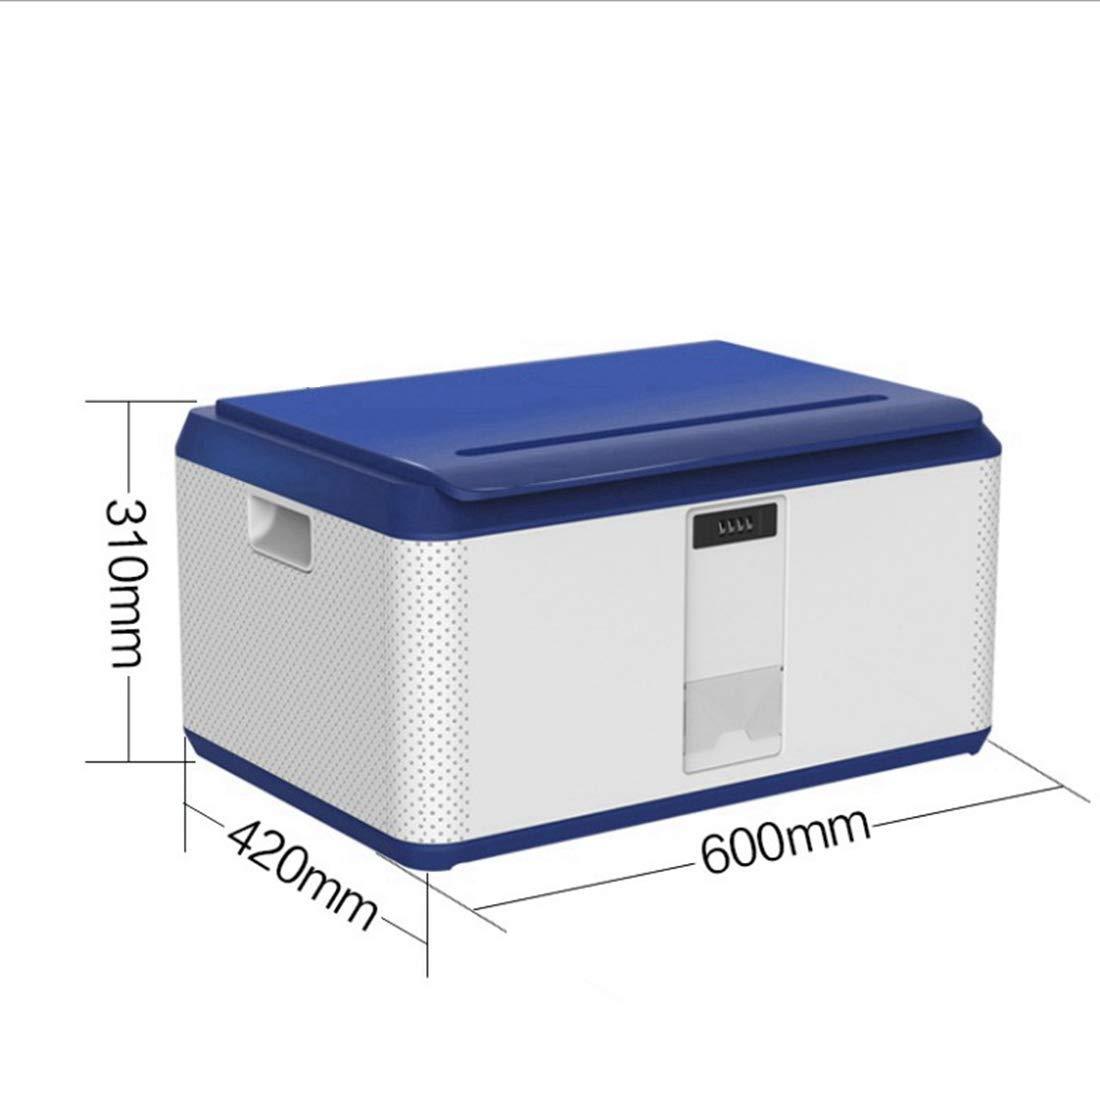 CAFUTY 多機能メカニカルロックボックス/大容量コレクションボックス (Color : ブルー) B07N37SH1N ブルー